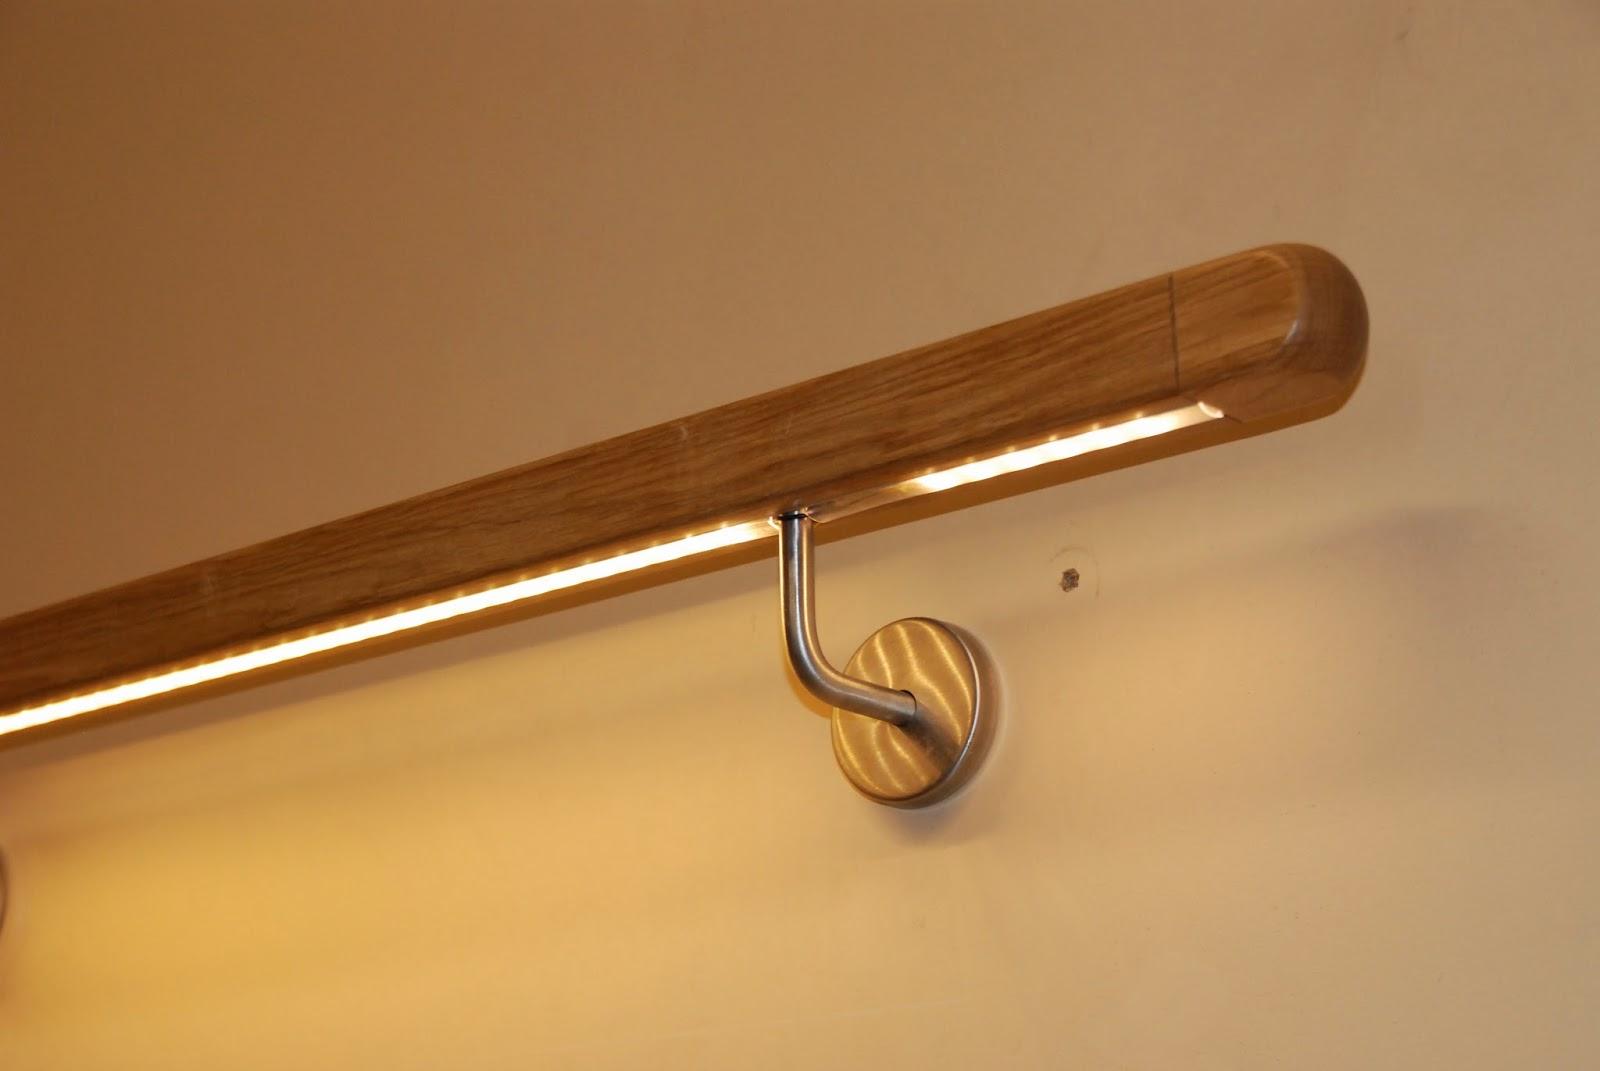 treppenrenovierung treppen handl ufe tipps zu fachgerechten. Black Bedroom Furniture Sets. Home Design Ideas